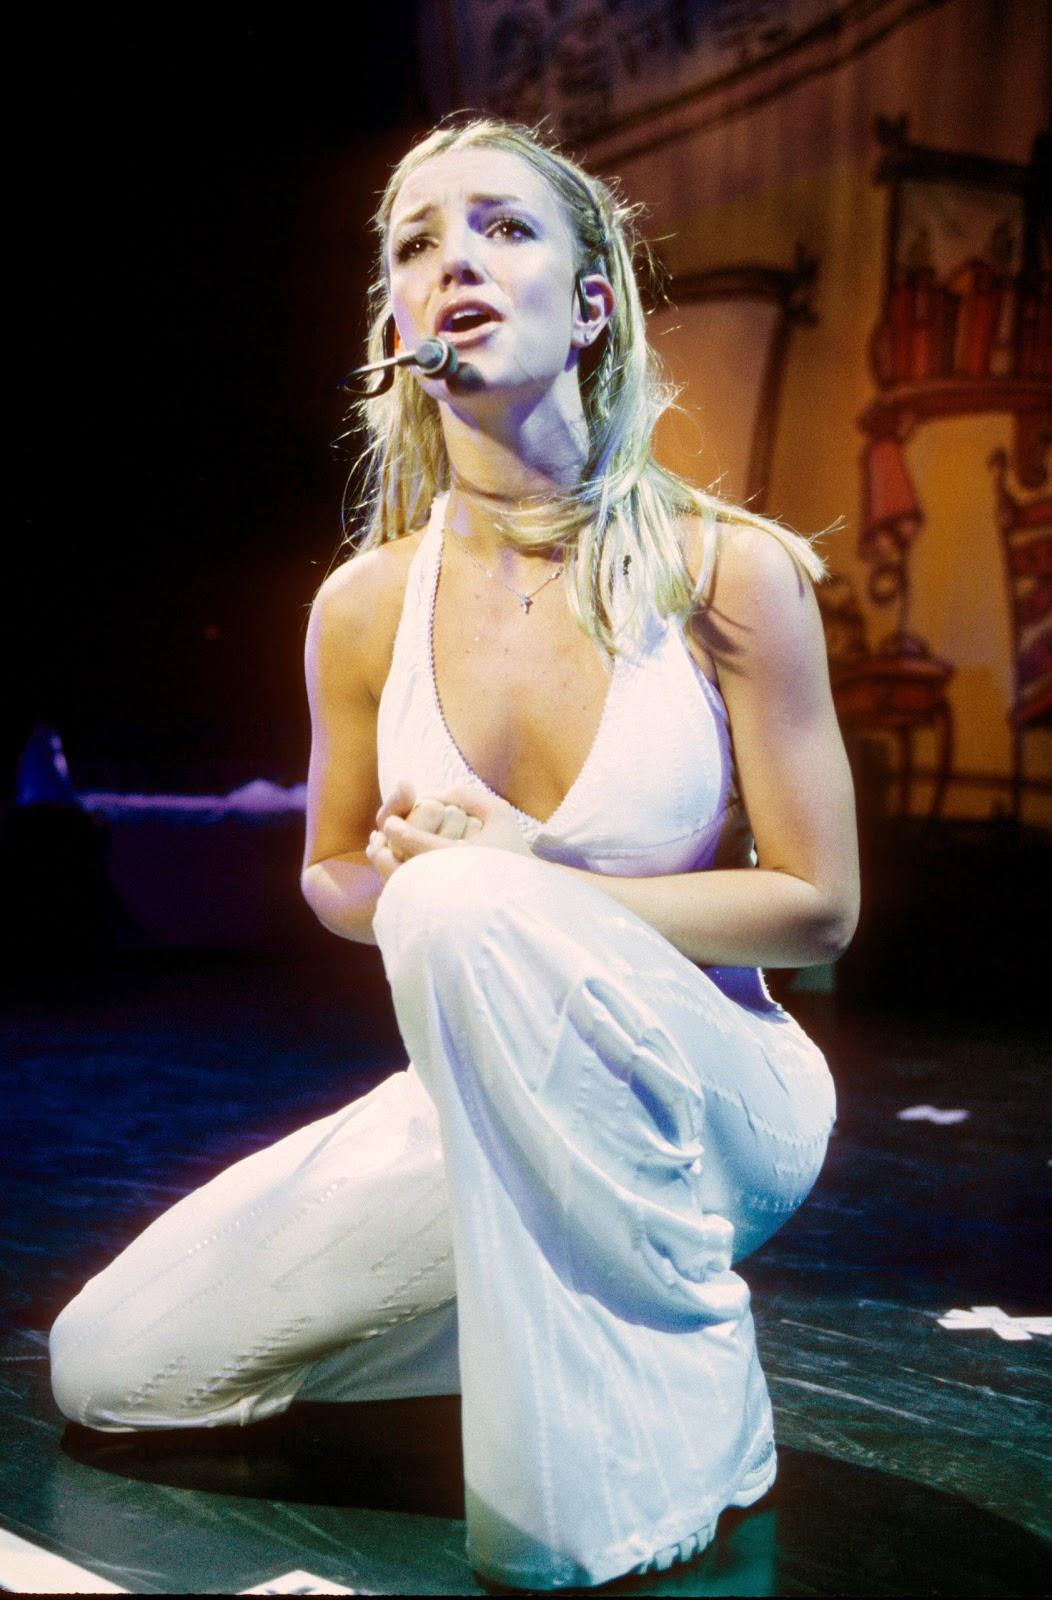 http://1.bp.blogspot.com/-Yx28pf9ZmsE/ThZtrquC4rI/AAAAAAAAFU0/Gg64y3FO0es/s1600/Britney+Spears-femme+fatale-circus-ooops+i+did+it+gain-pics-Britney+Spears+2011-+%252859%2529.jpg